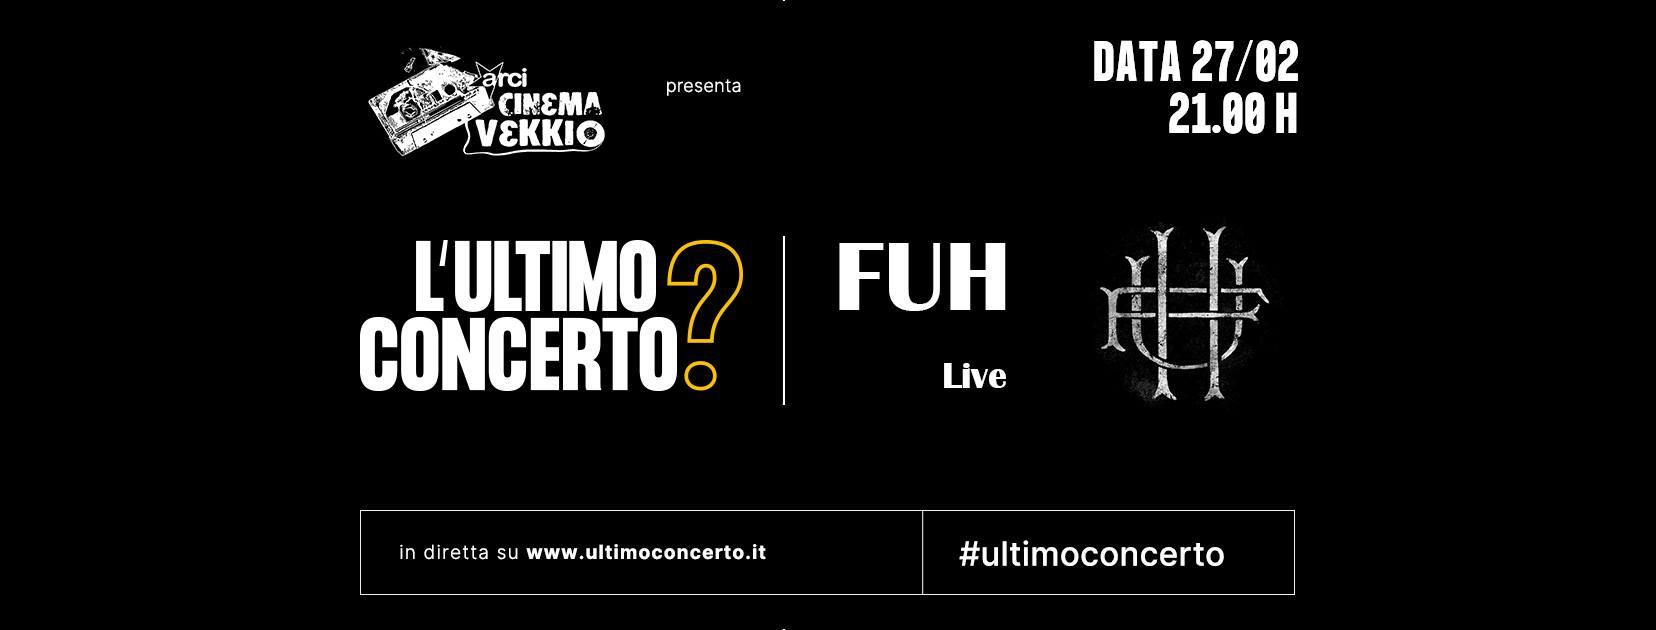 Fuh live, L'Ultimo Concerto? Cinema Vekkio Corneliano d'Alba